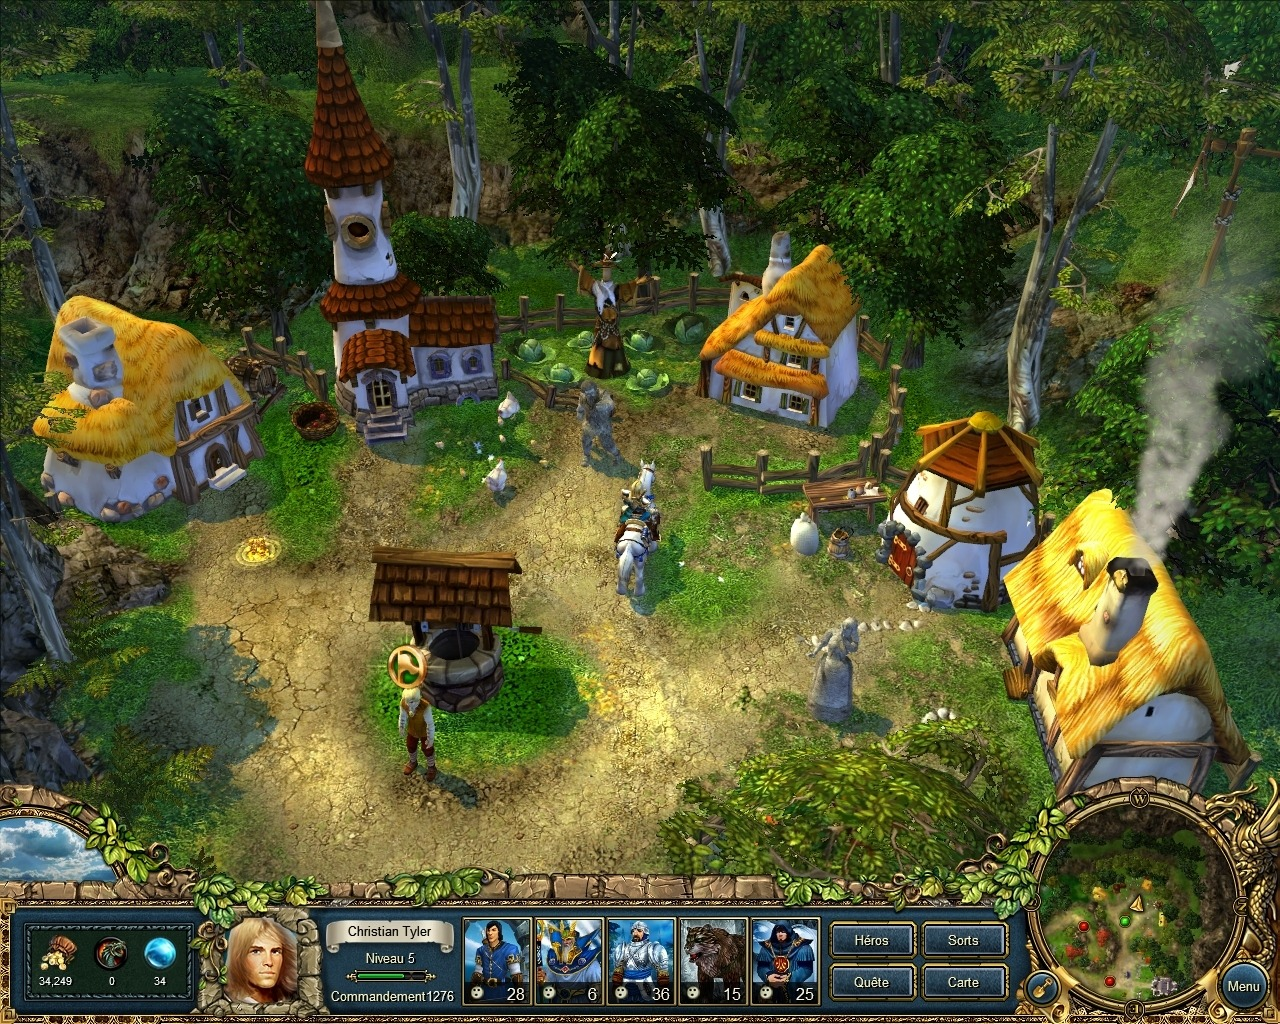 King's Bounty: Легенда о рыцаре. pic Дата выхода: 23 сентября 2008. .